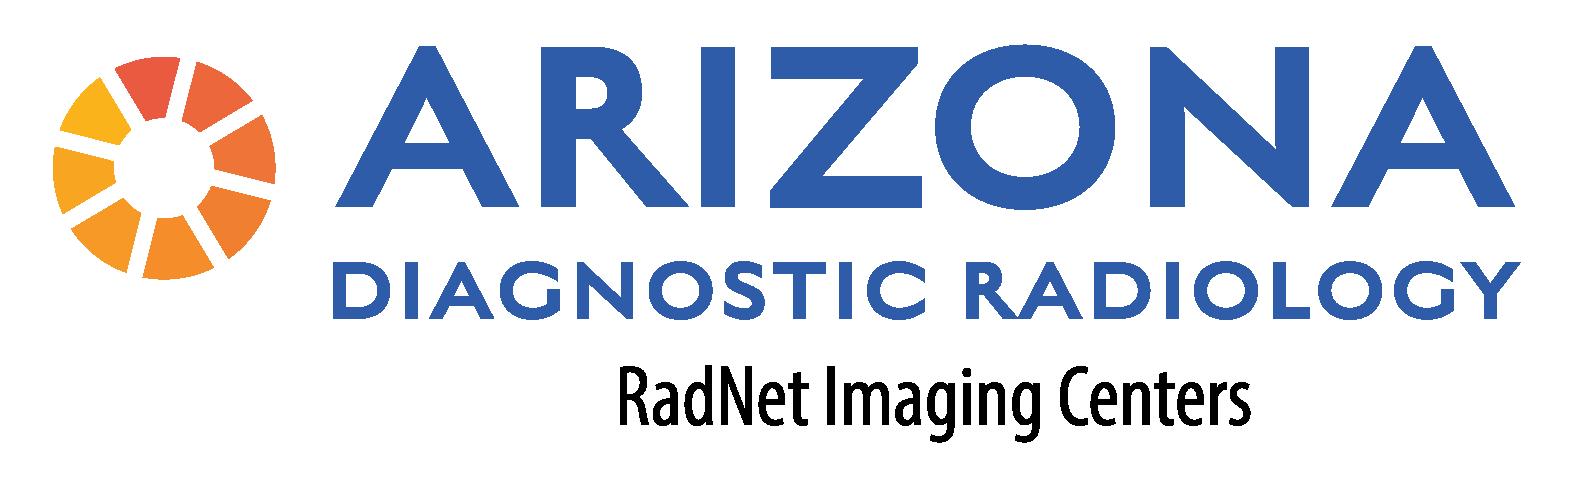 Arizona-Diagnostic-Radiology-Logo-White